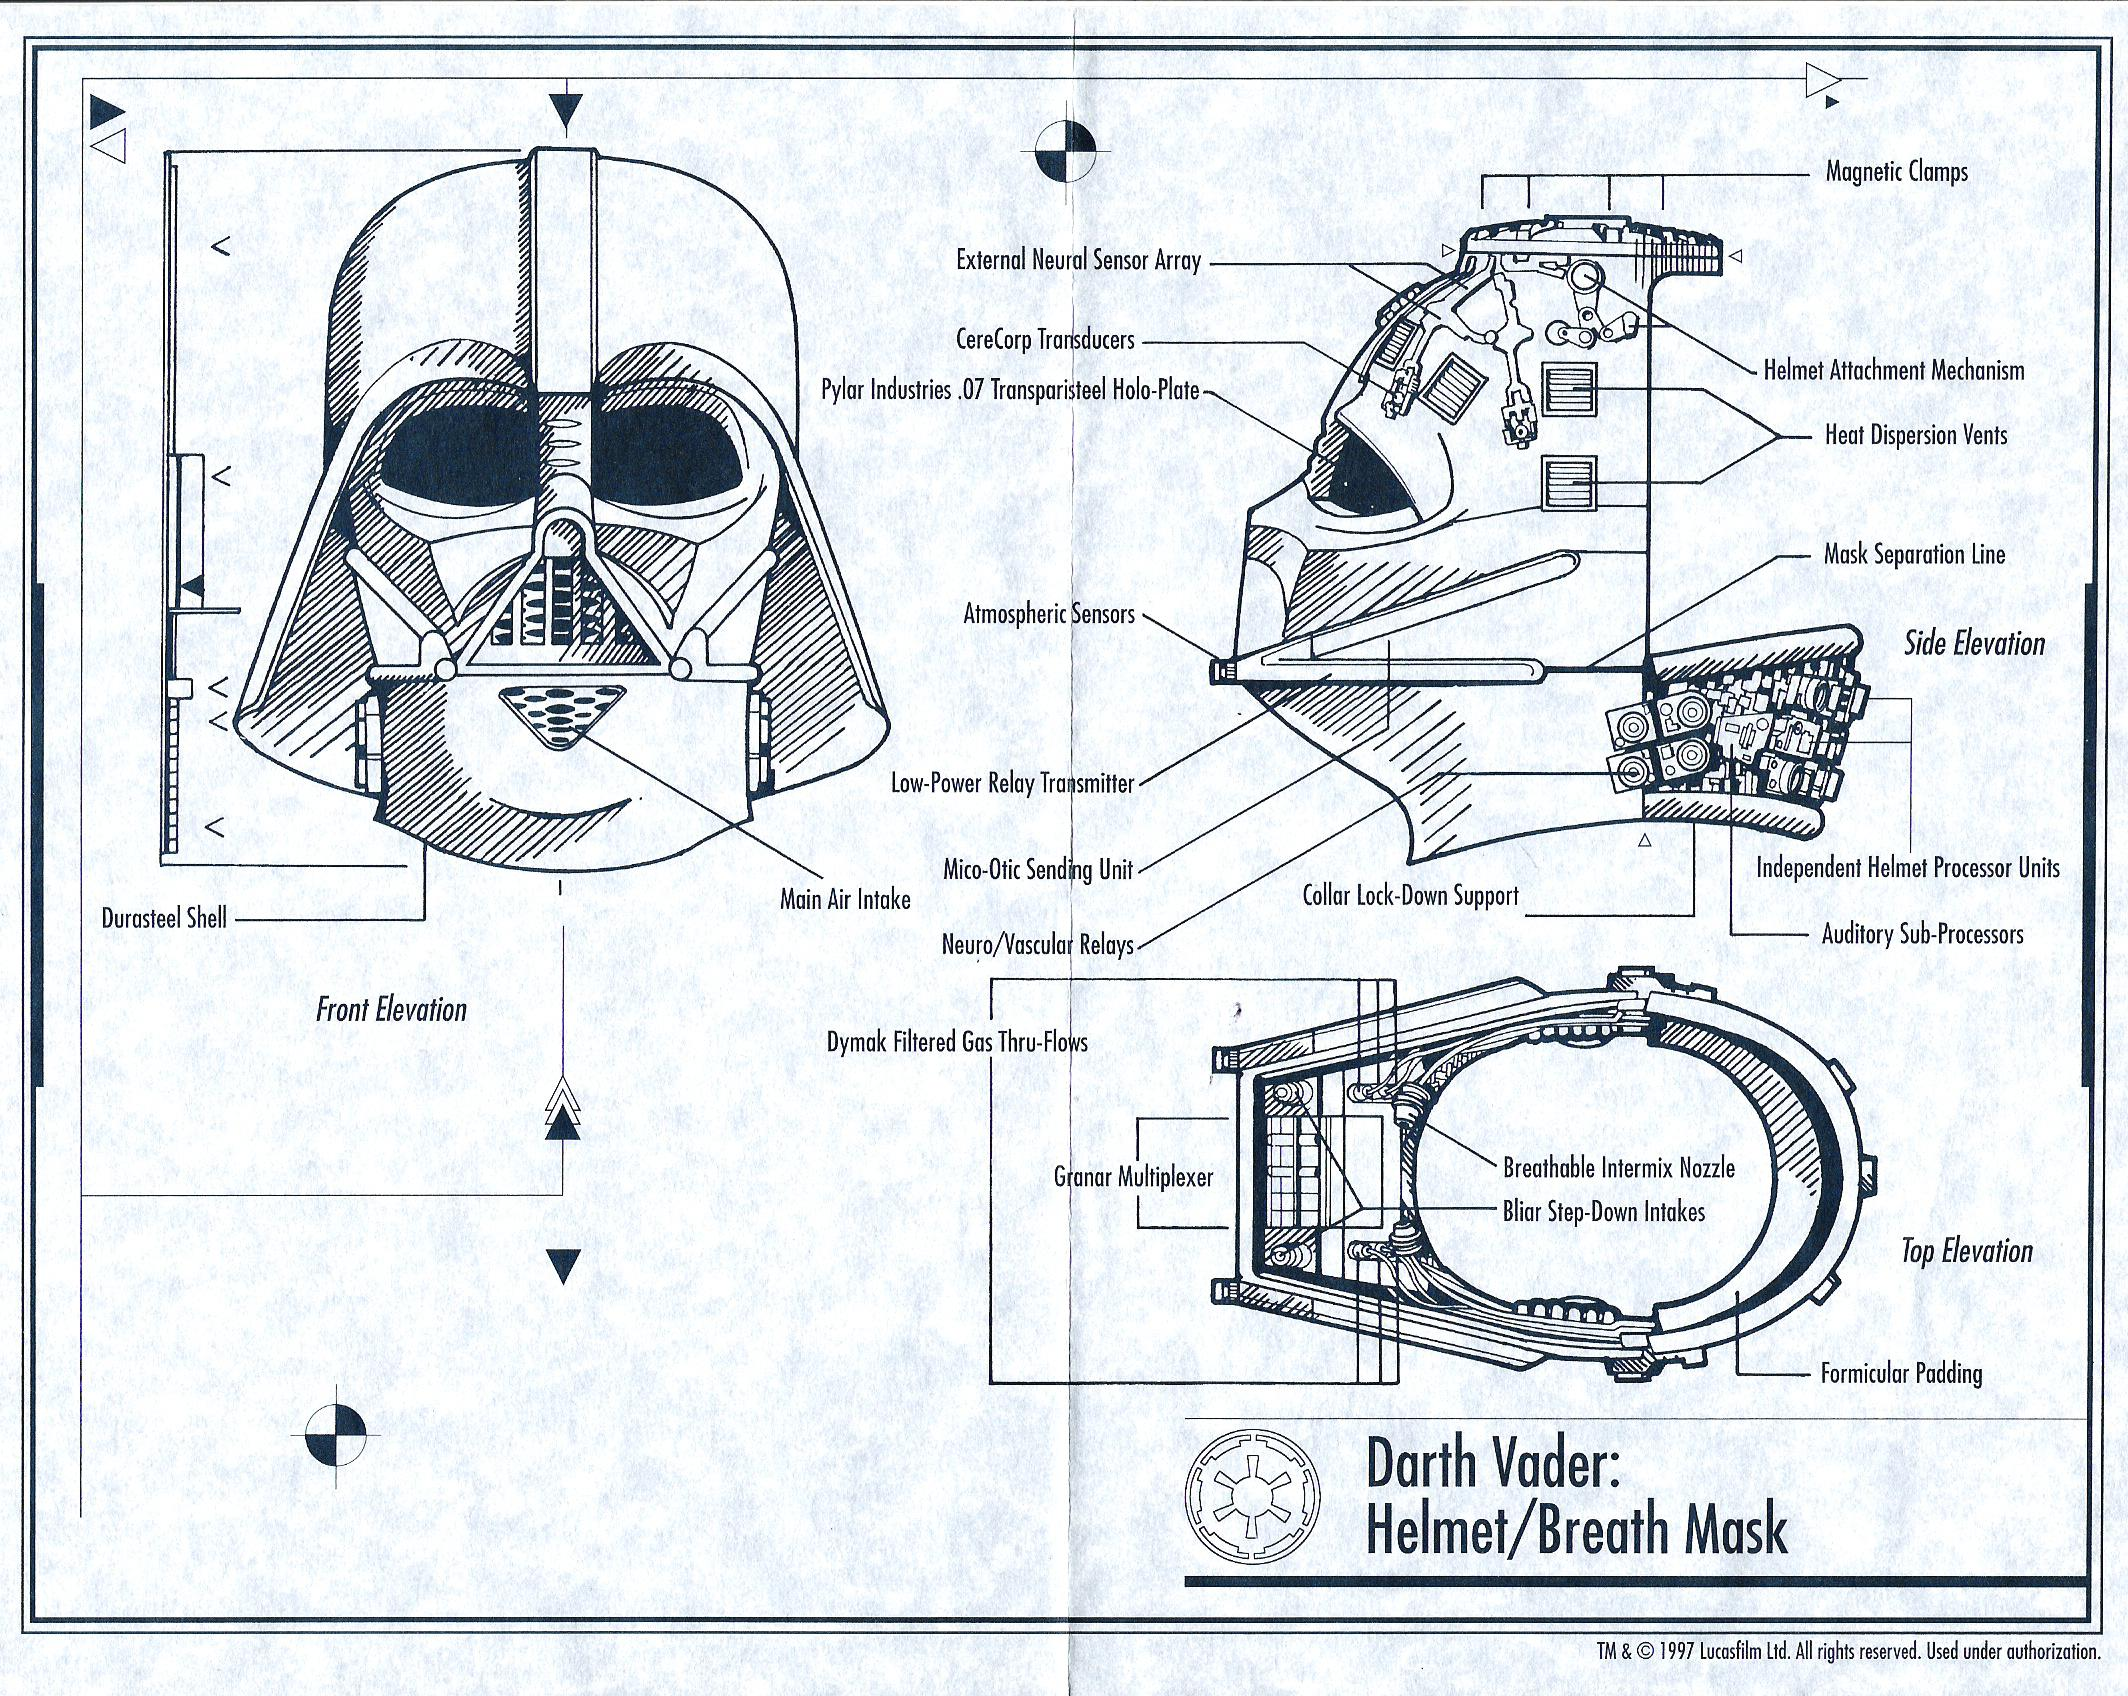 Darth Vader Helmet Blueprints Reveal His Inner Secrets | Bit ... on